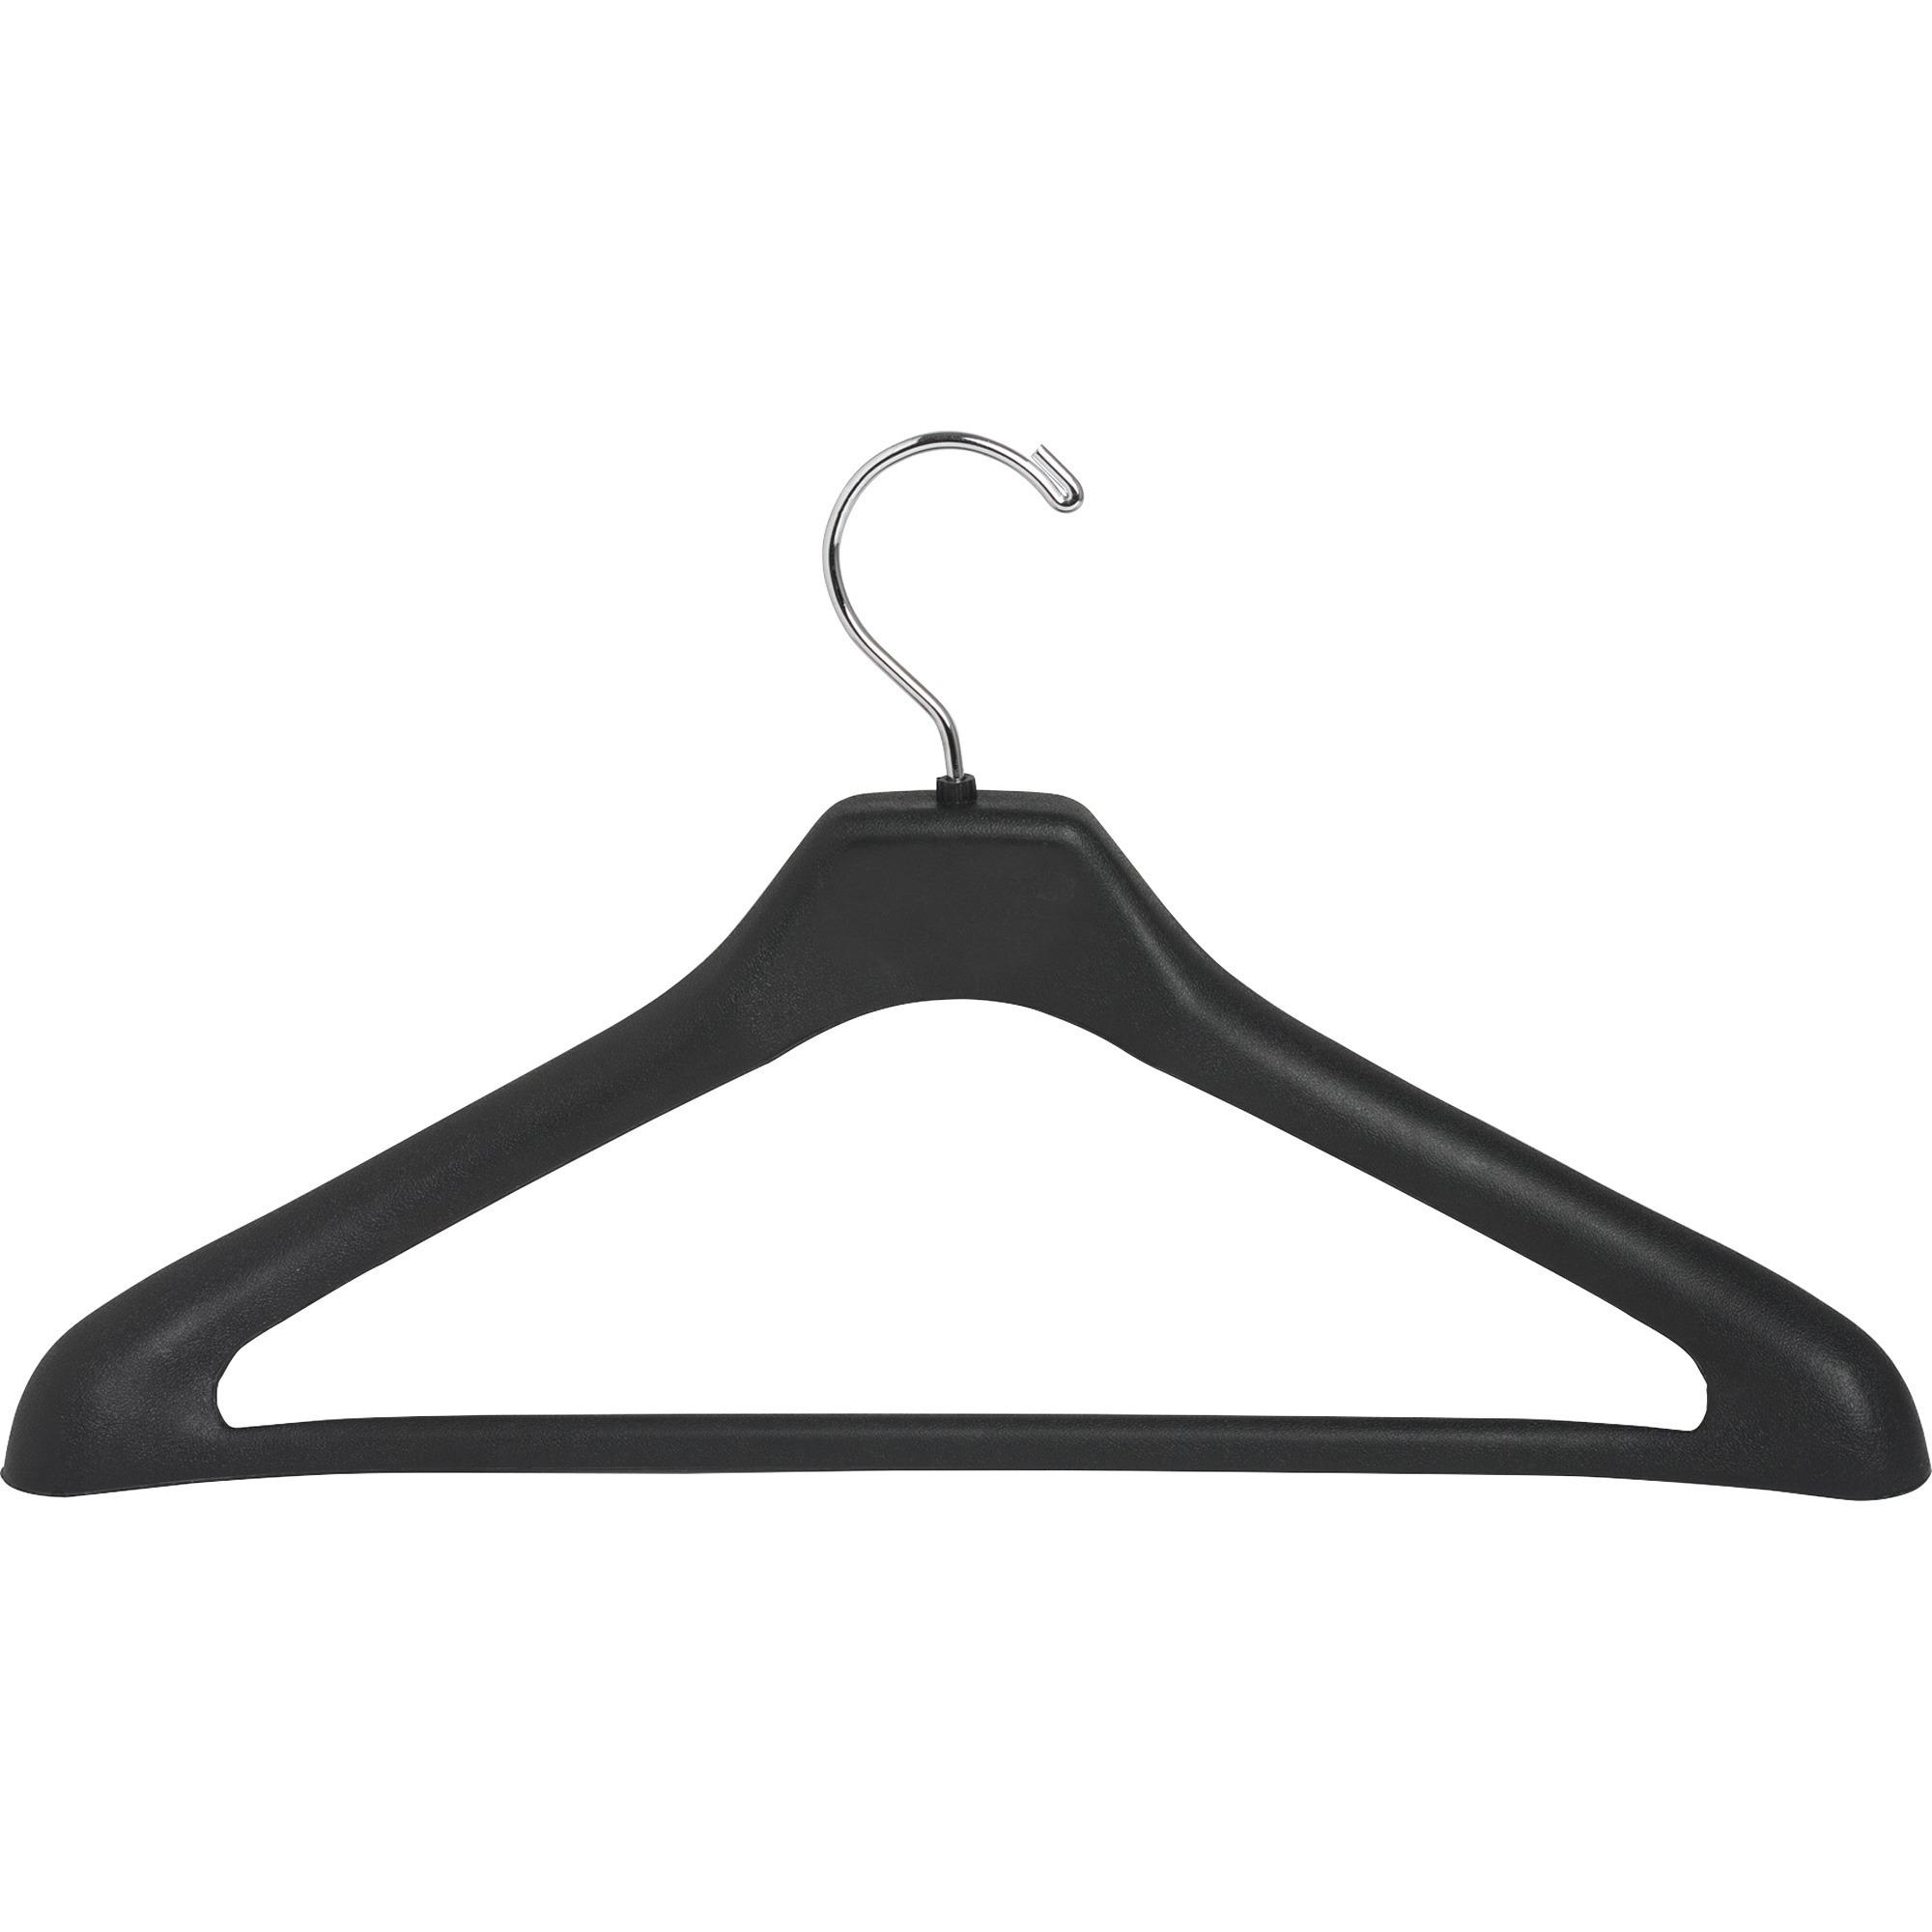 Lorell 1 Piece Plastic Suit Hangers   For Garment   Plastic, Metal   Black    24 / Pack